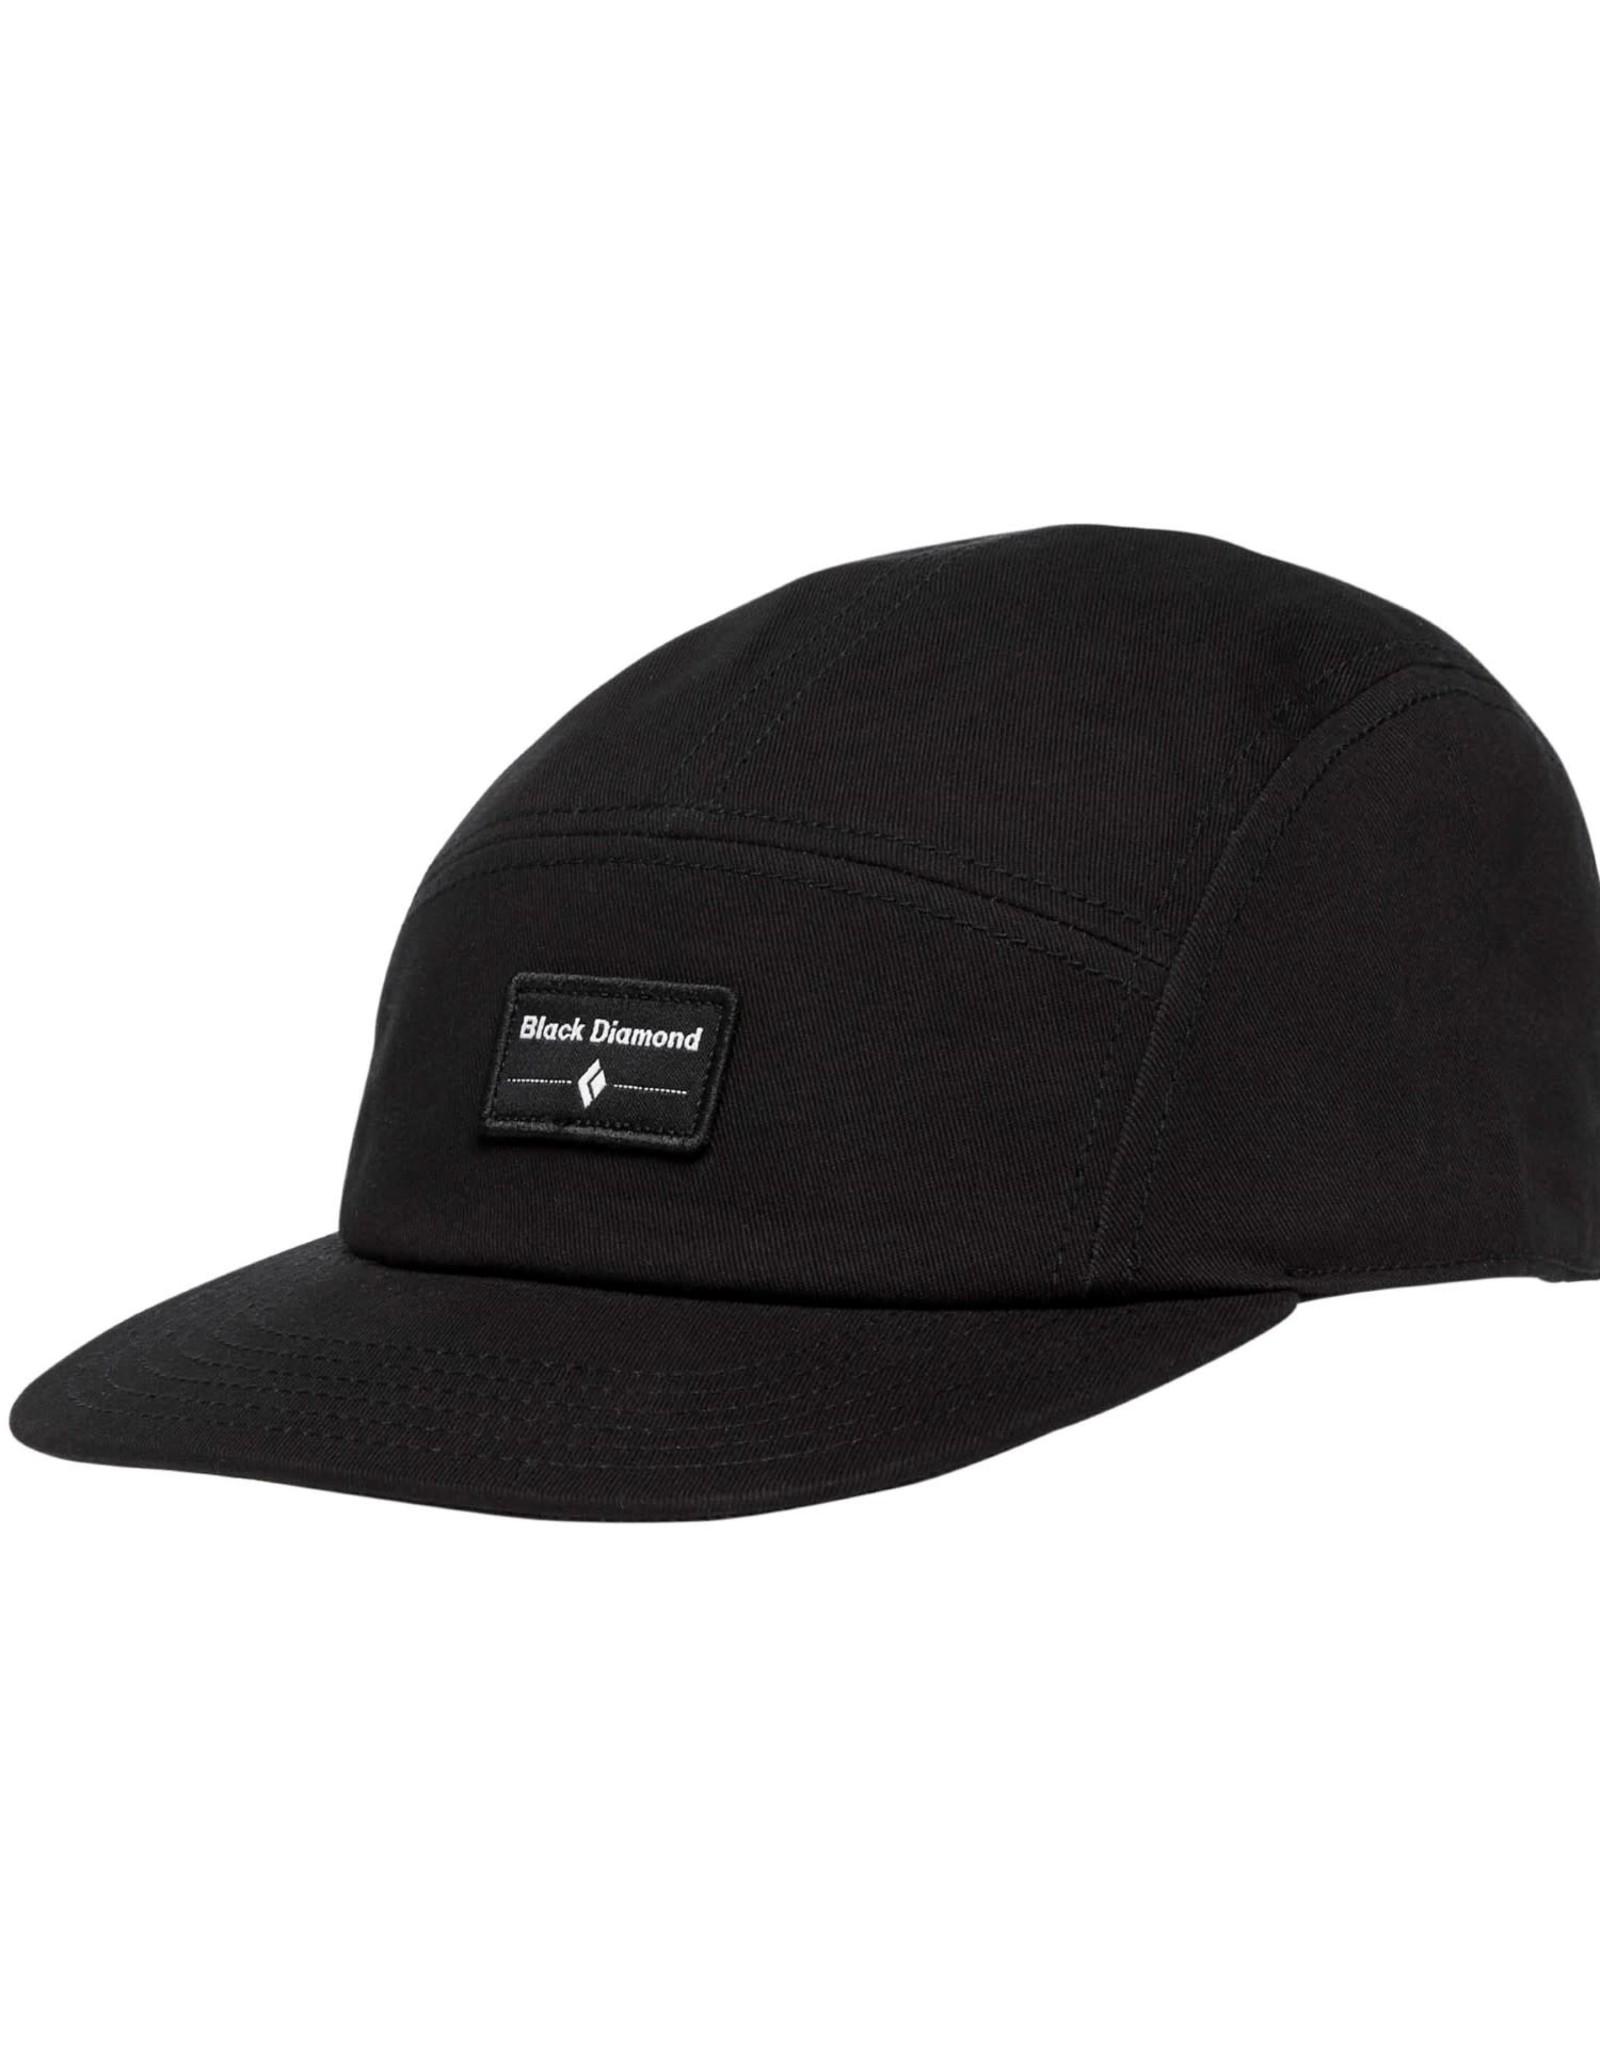 Black Diamond Black Diamond Camper Cap - Unisex